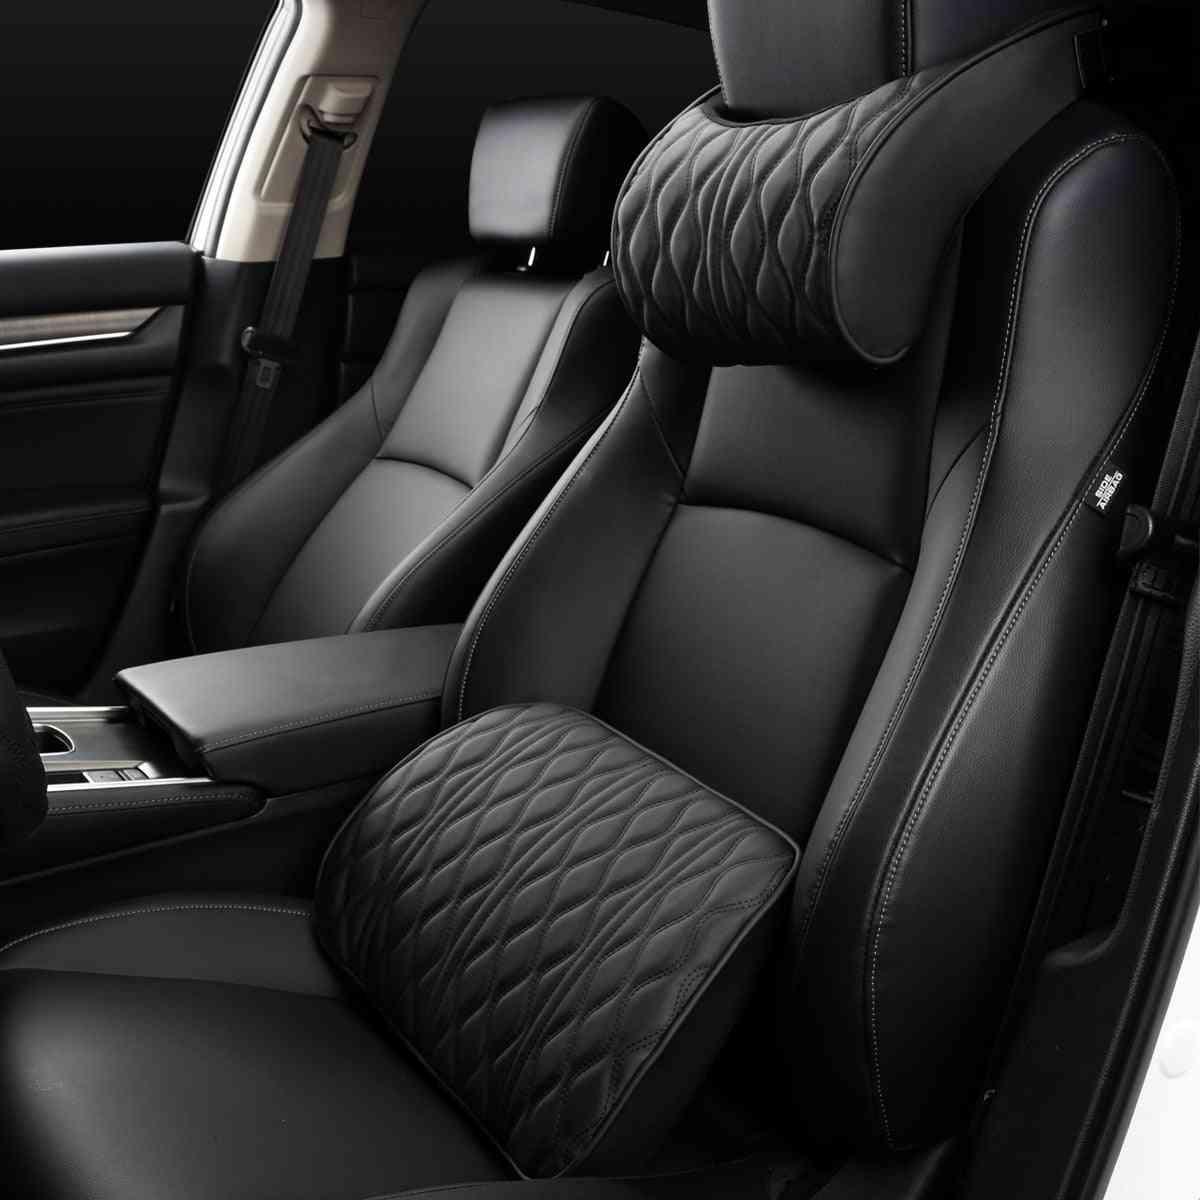 Adjustment Leather Seat, Back Cushion, Memory Foam, Headrest Neck Pillows